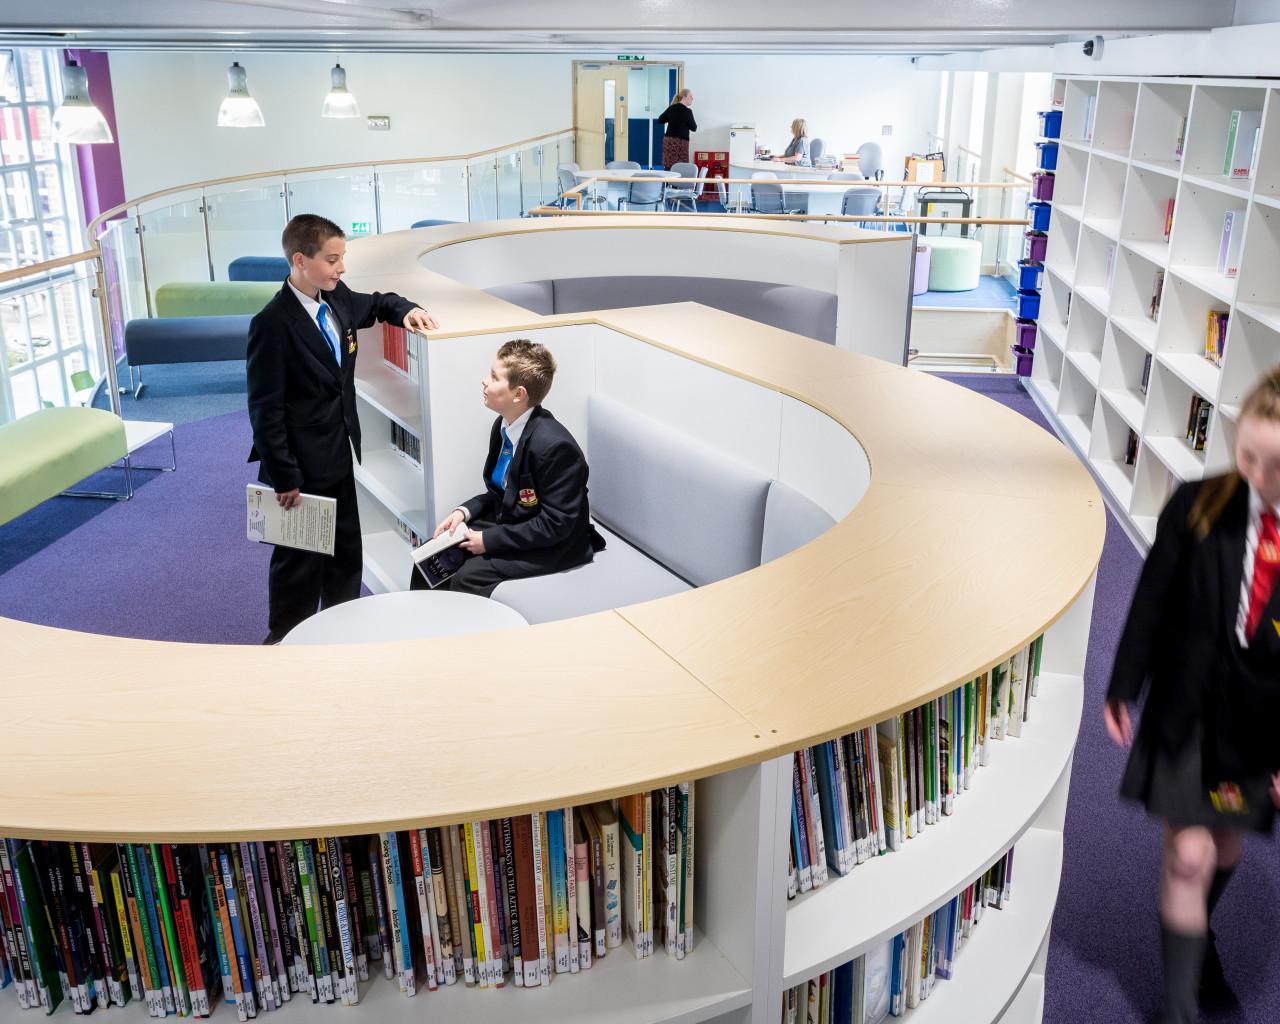 Corporate office design Skelmersdale, Wigan, St Helens, Widnes, Runcorn, Chester